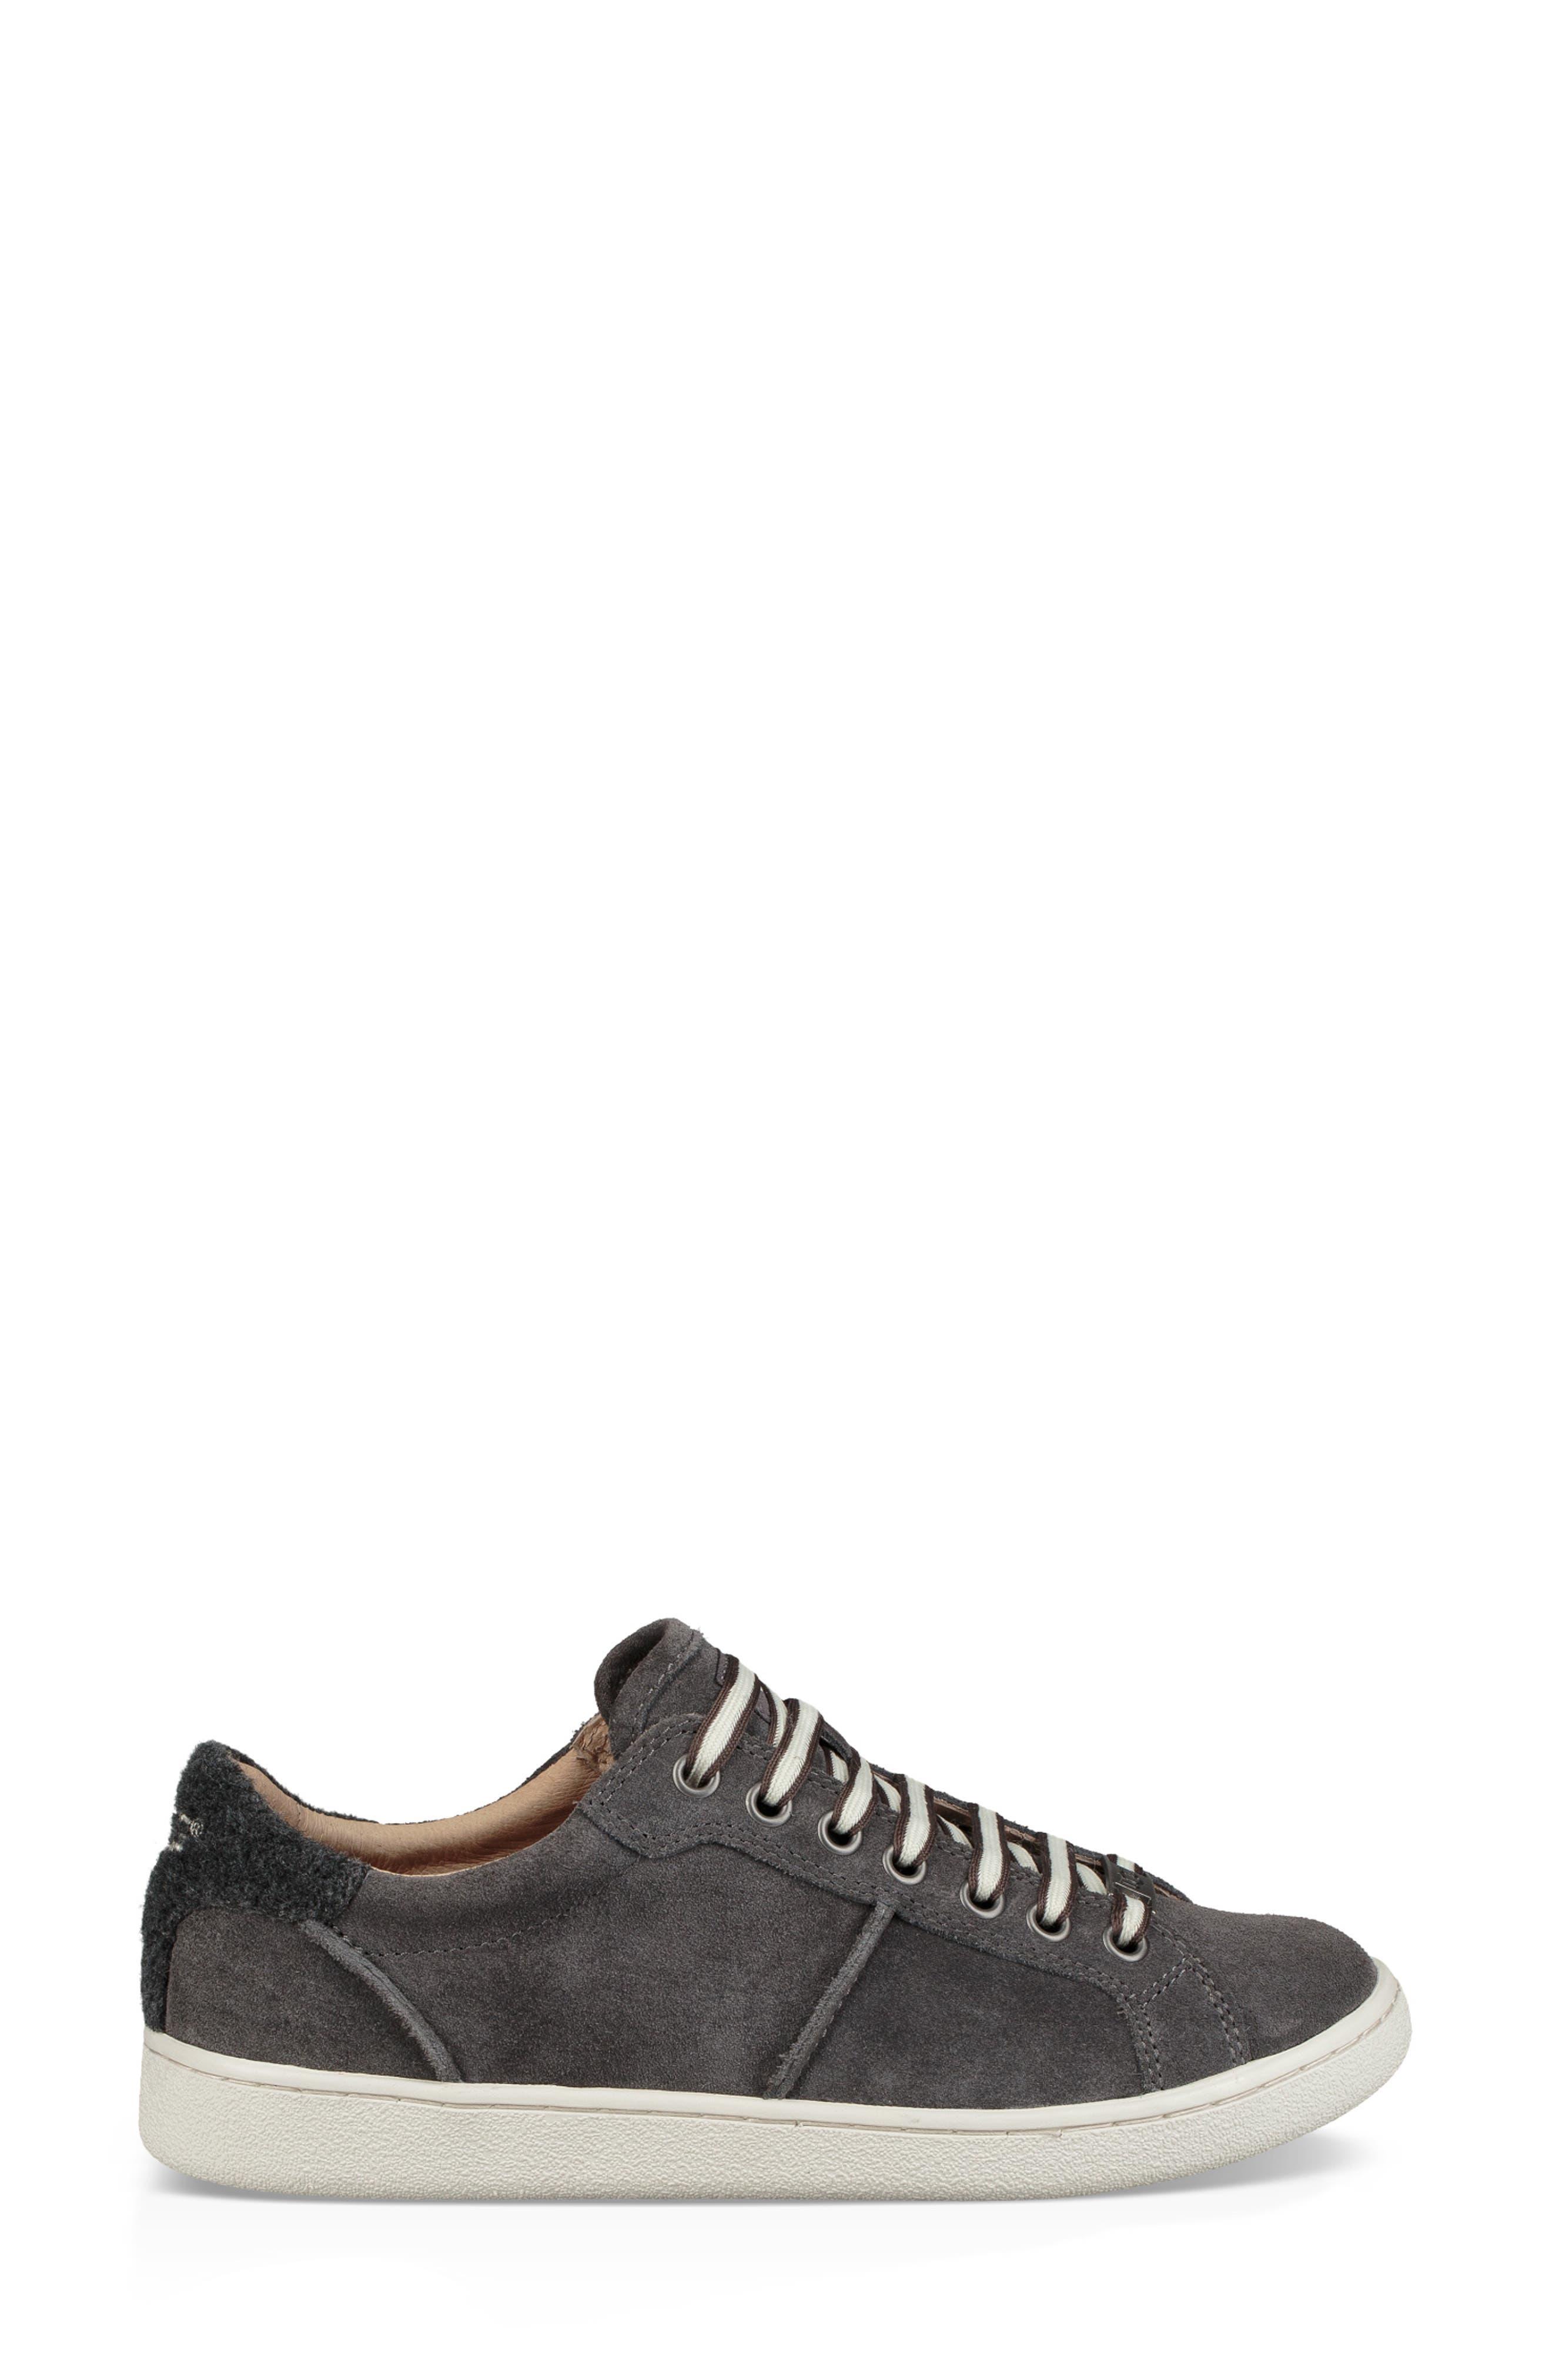 Milo Sneaker,                             Alternate thumbnail 3, color,                             CHARCOAL SUEDE